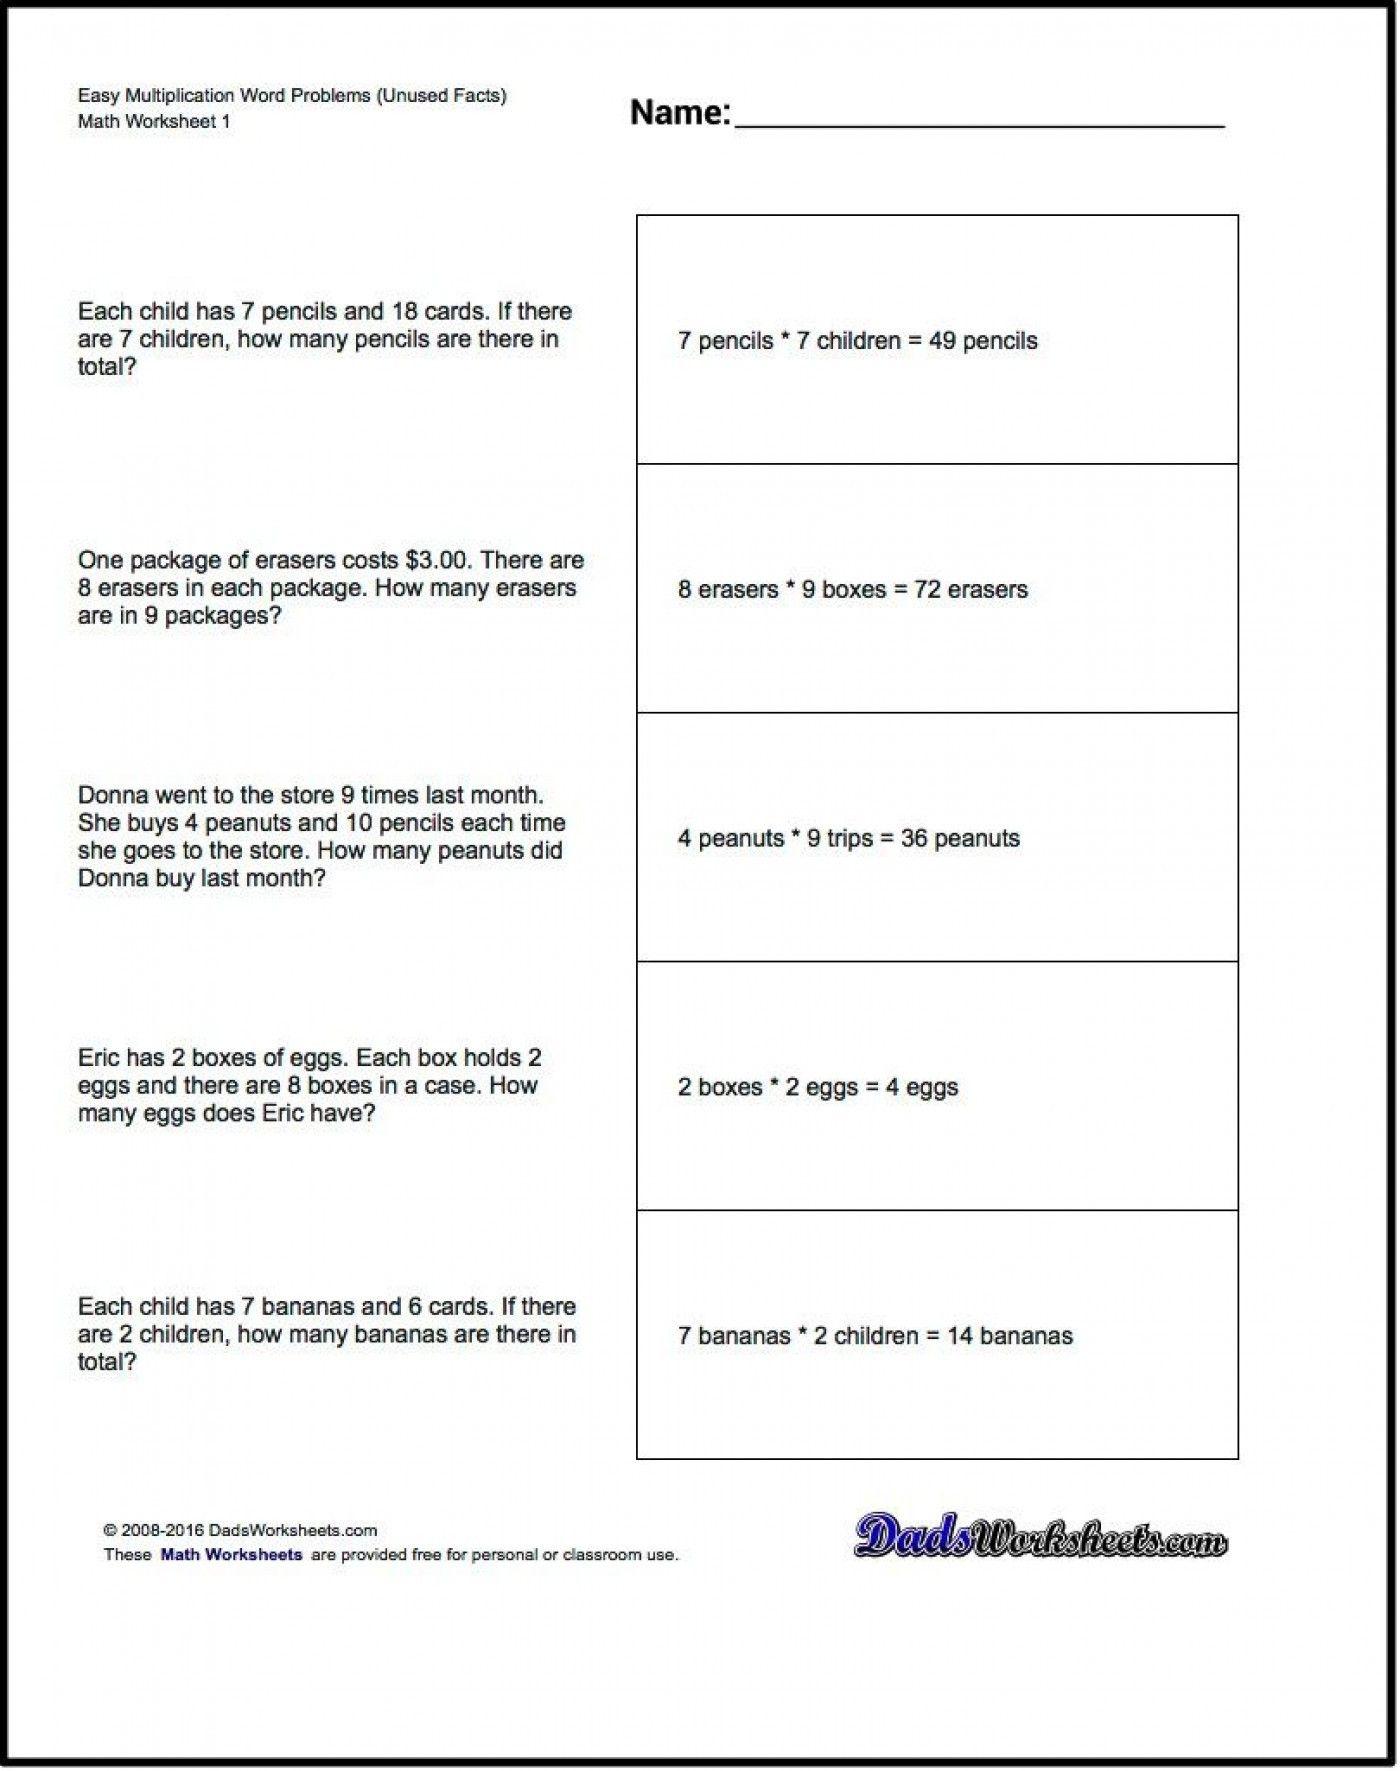 4 Free Math Worksheets Second Grade 2 Addition Add In Columns Missing Addend 016 Year Homewor Math Word Problems Division Word Problems Word Problems